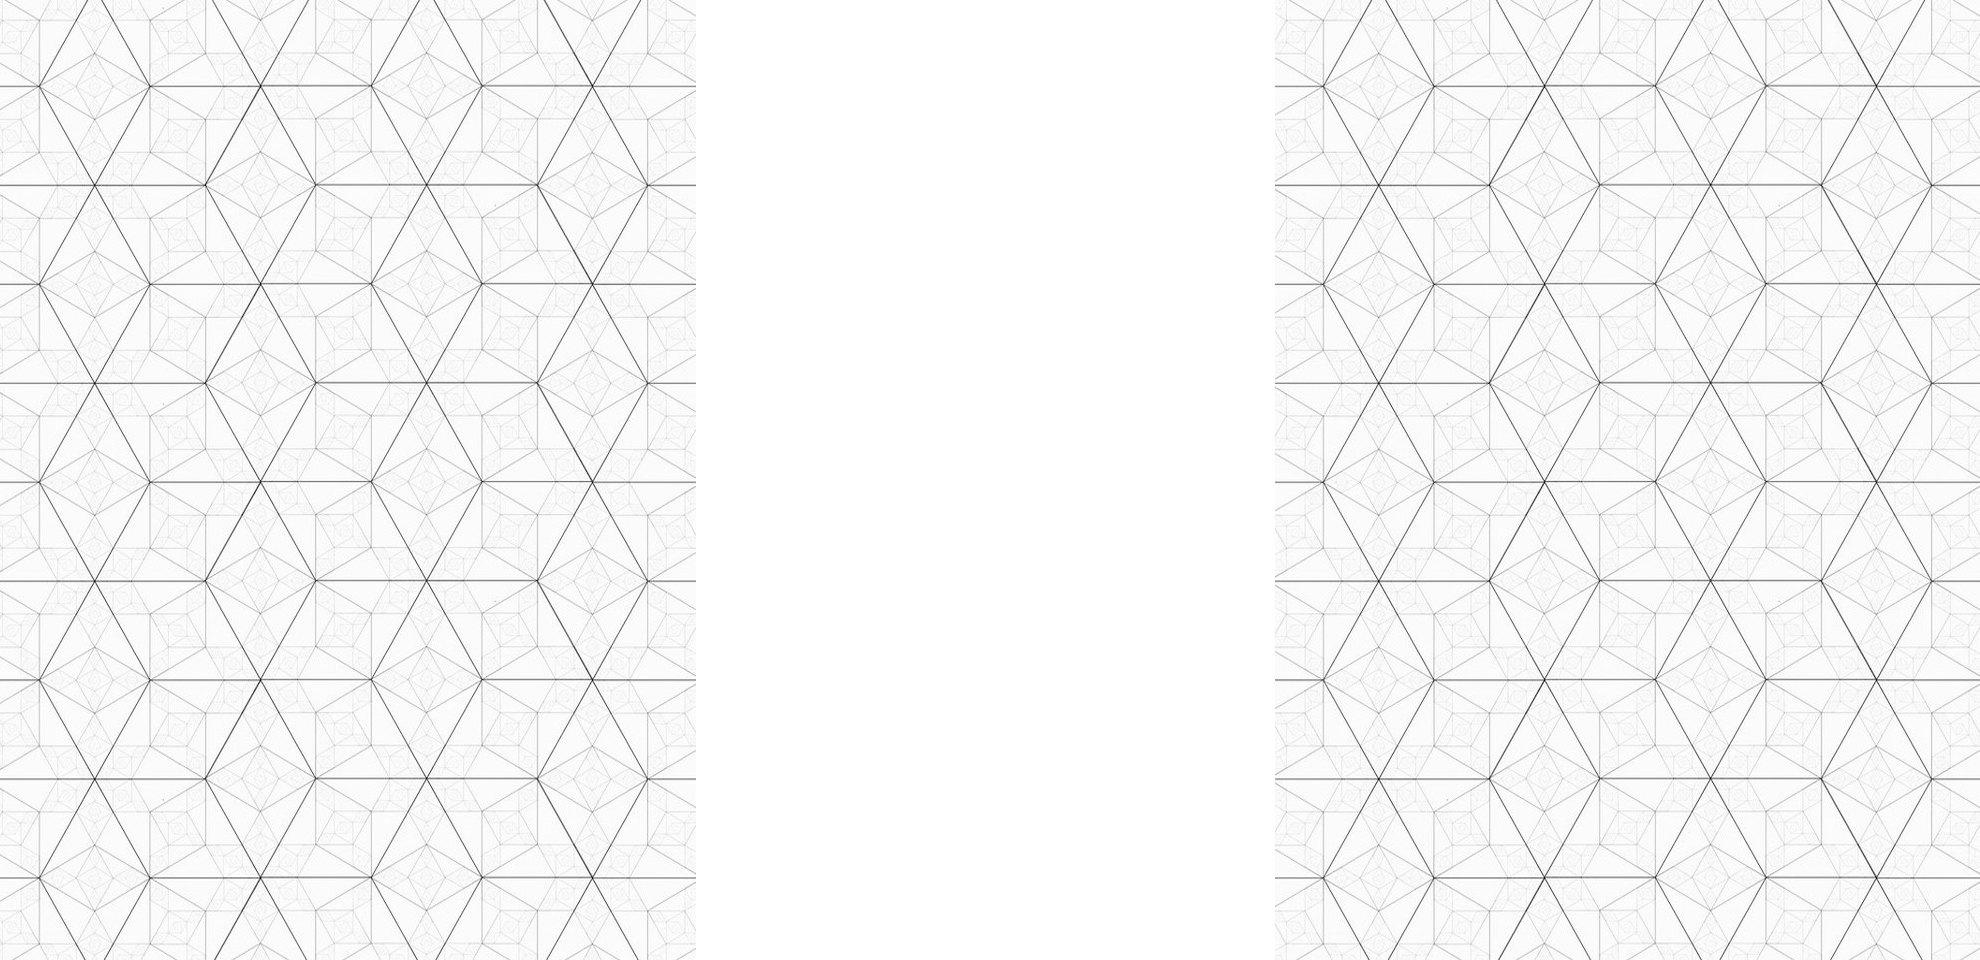 bg_textura06.jpg